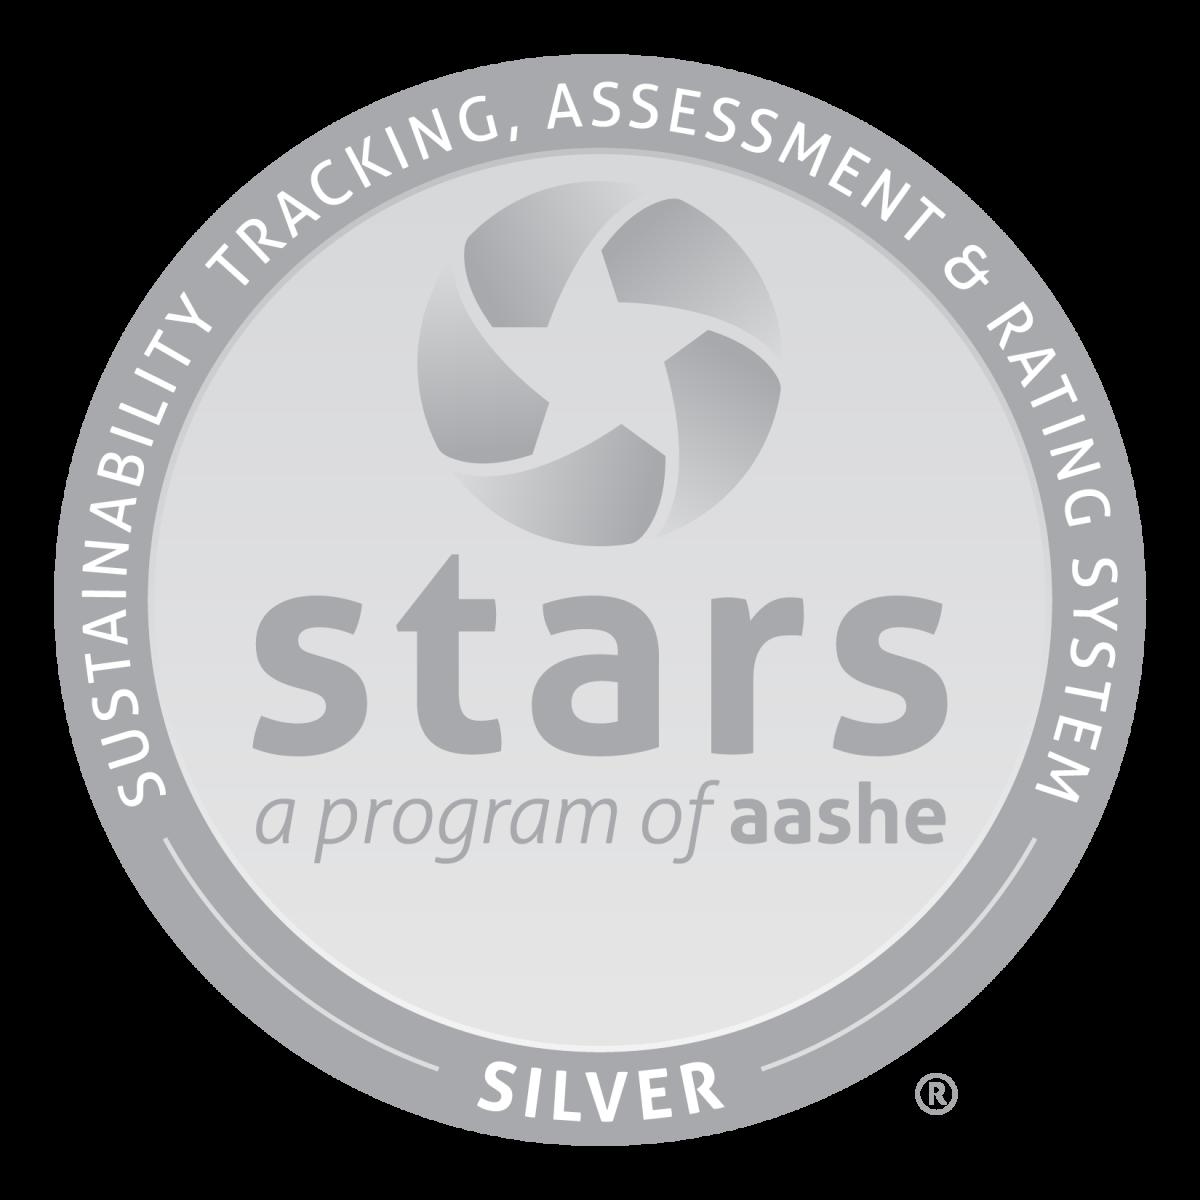 STARS Silver award designation seal